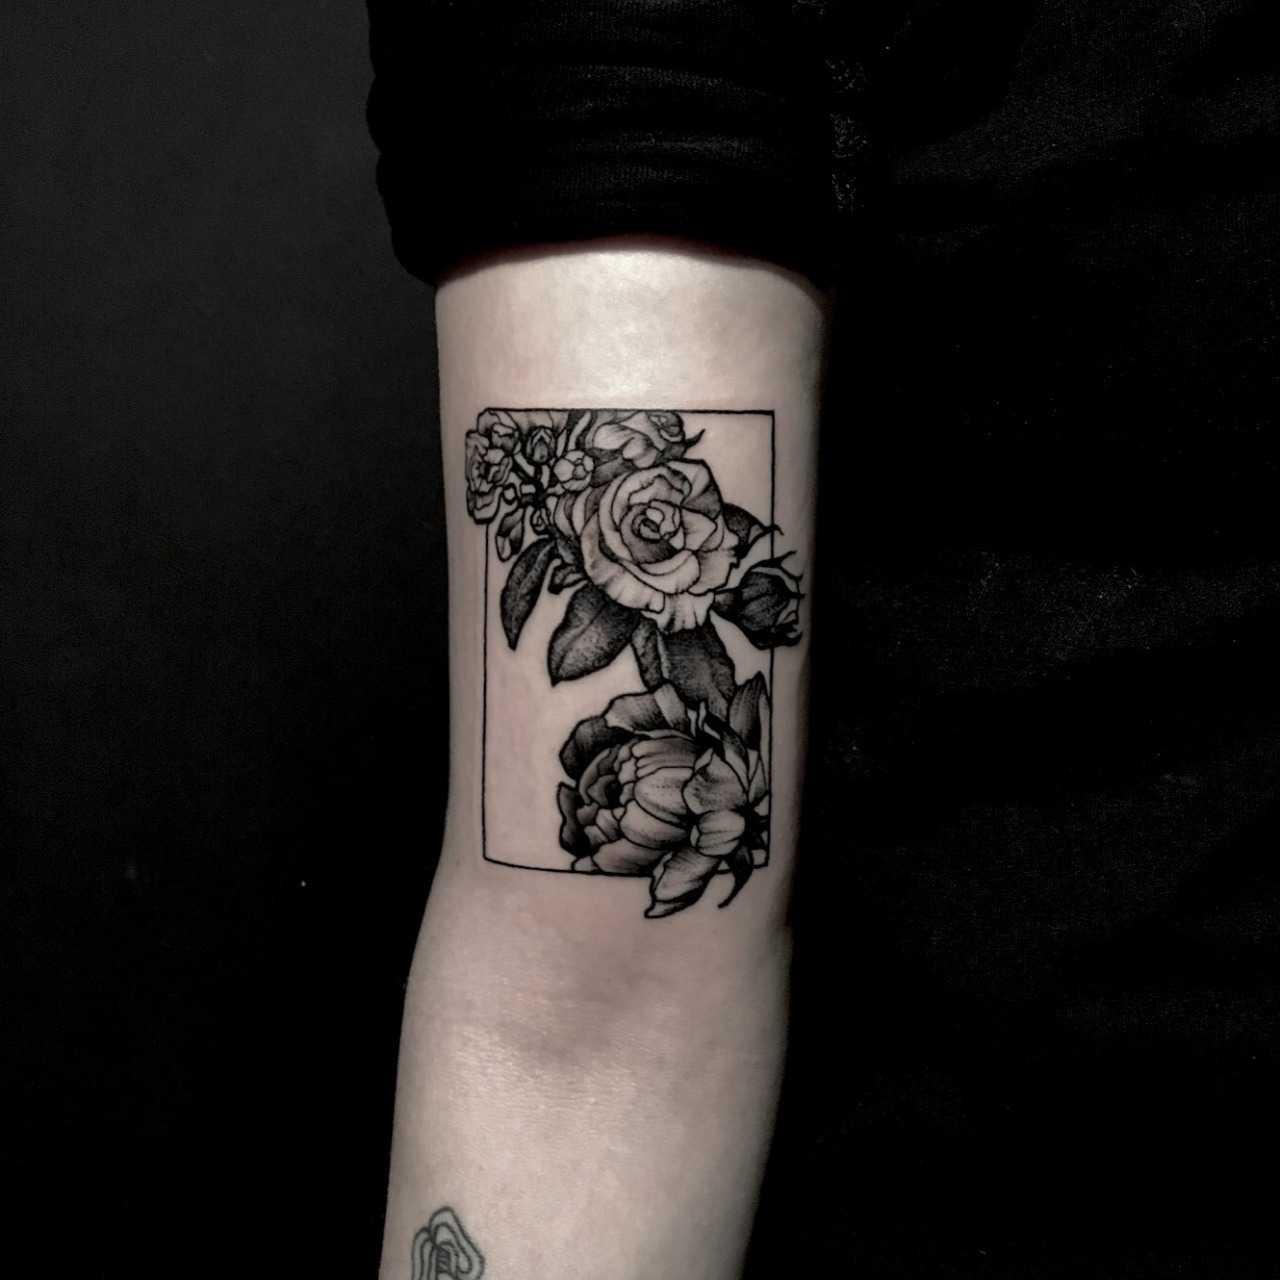 Roses by Berkin Dönmez